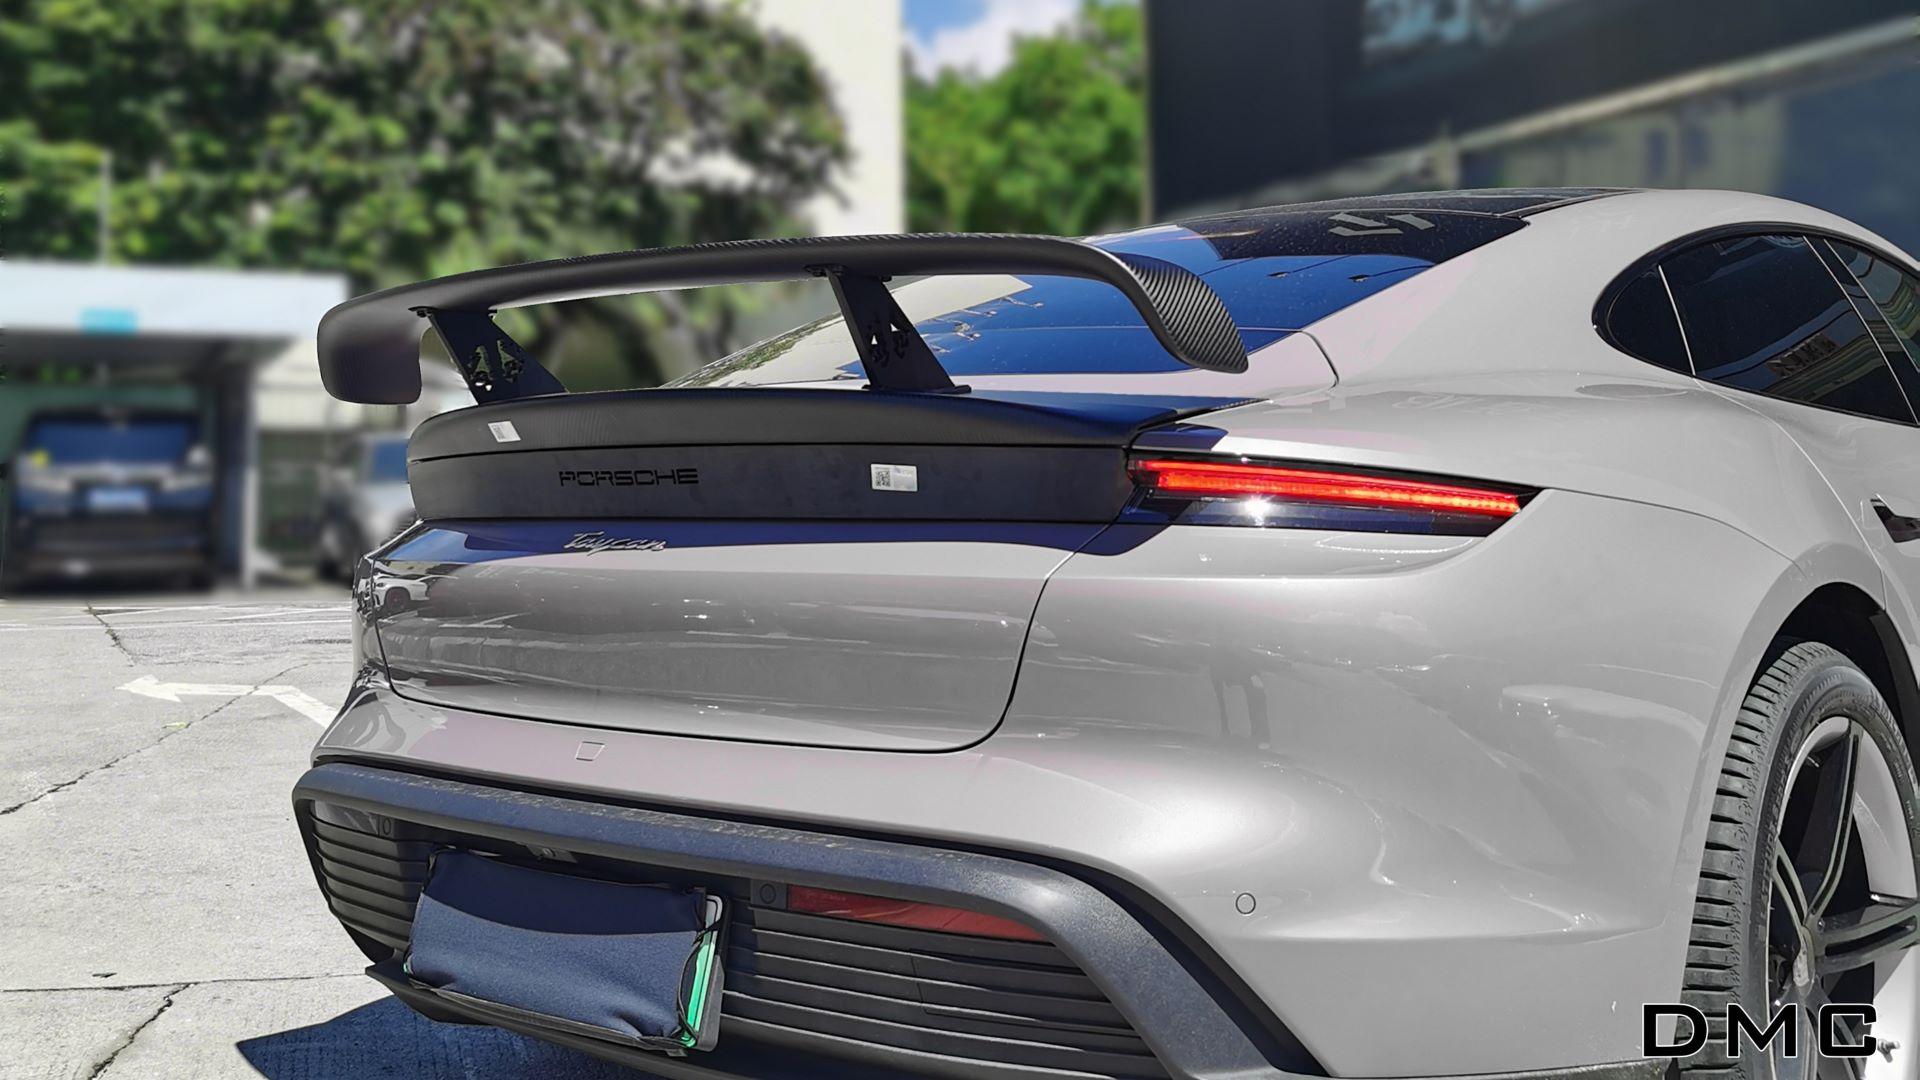 Porsche-Taycan-by-DMC-5